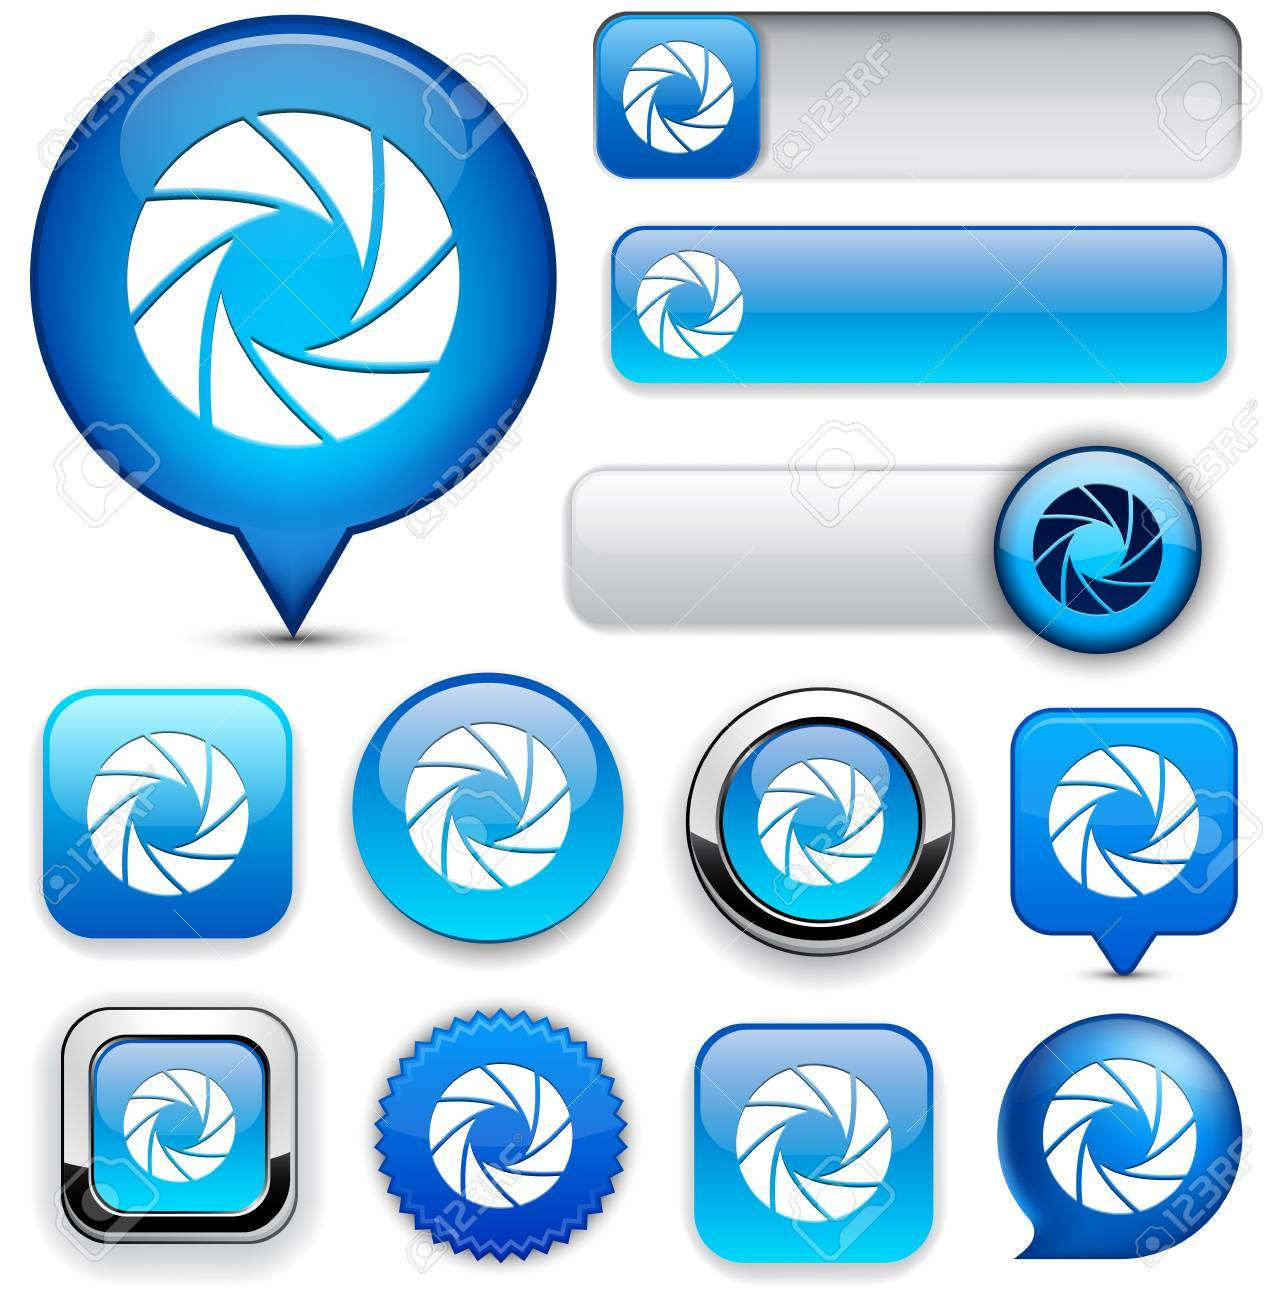 Aperture blue design elements for website or app. Vector eps10. Stock Vector - 12856722